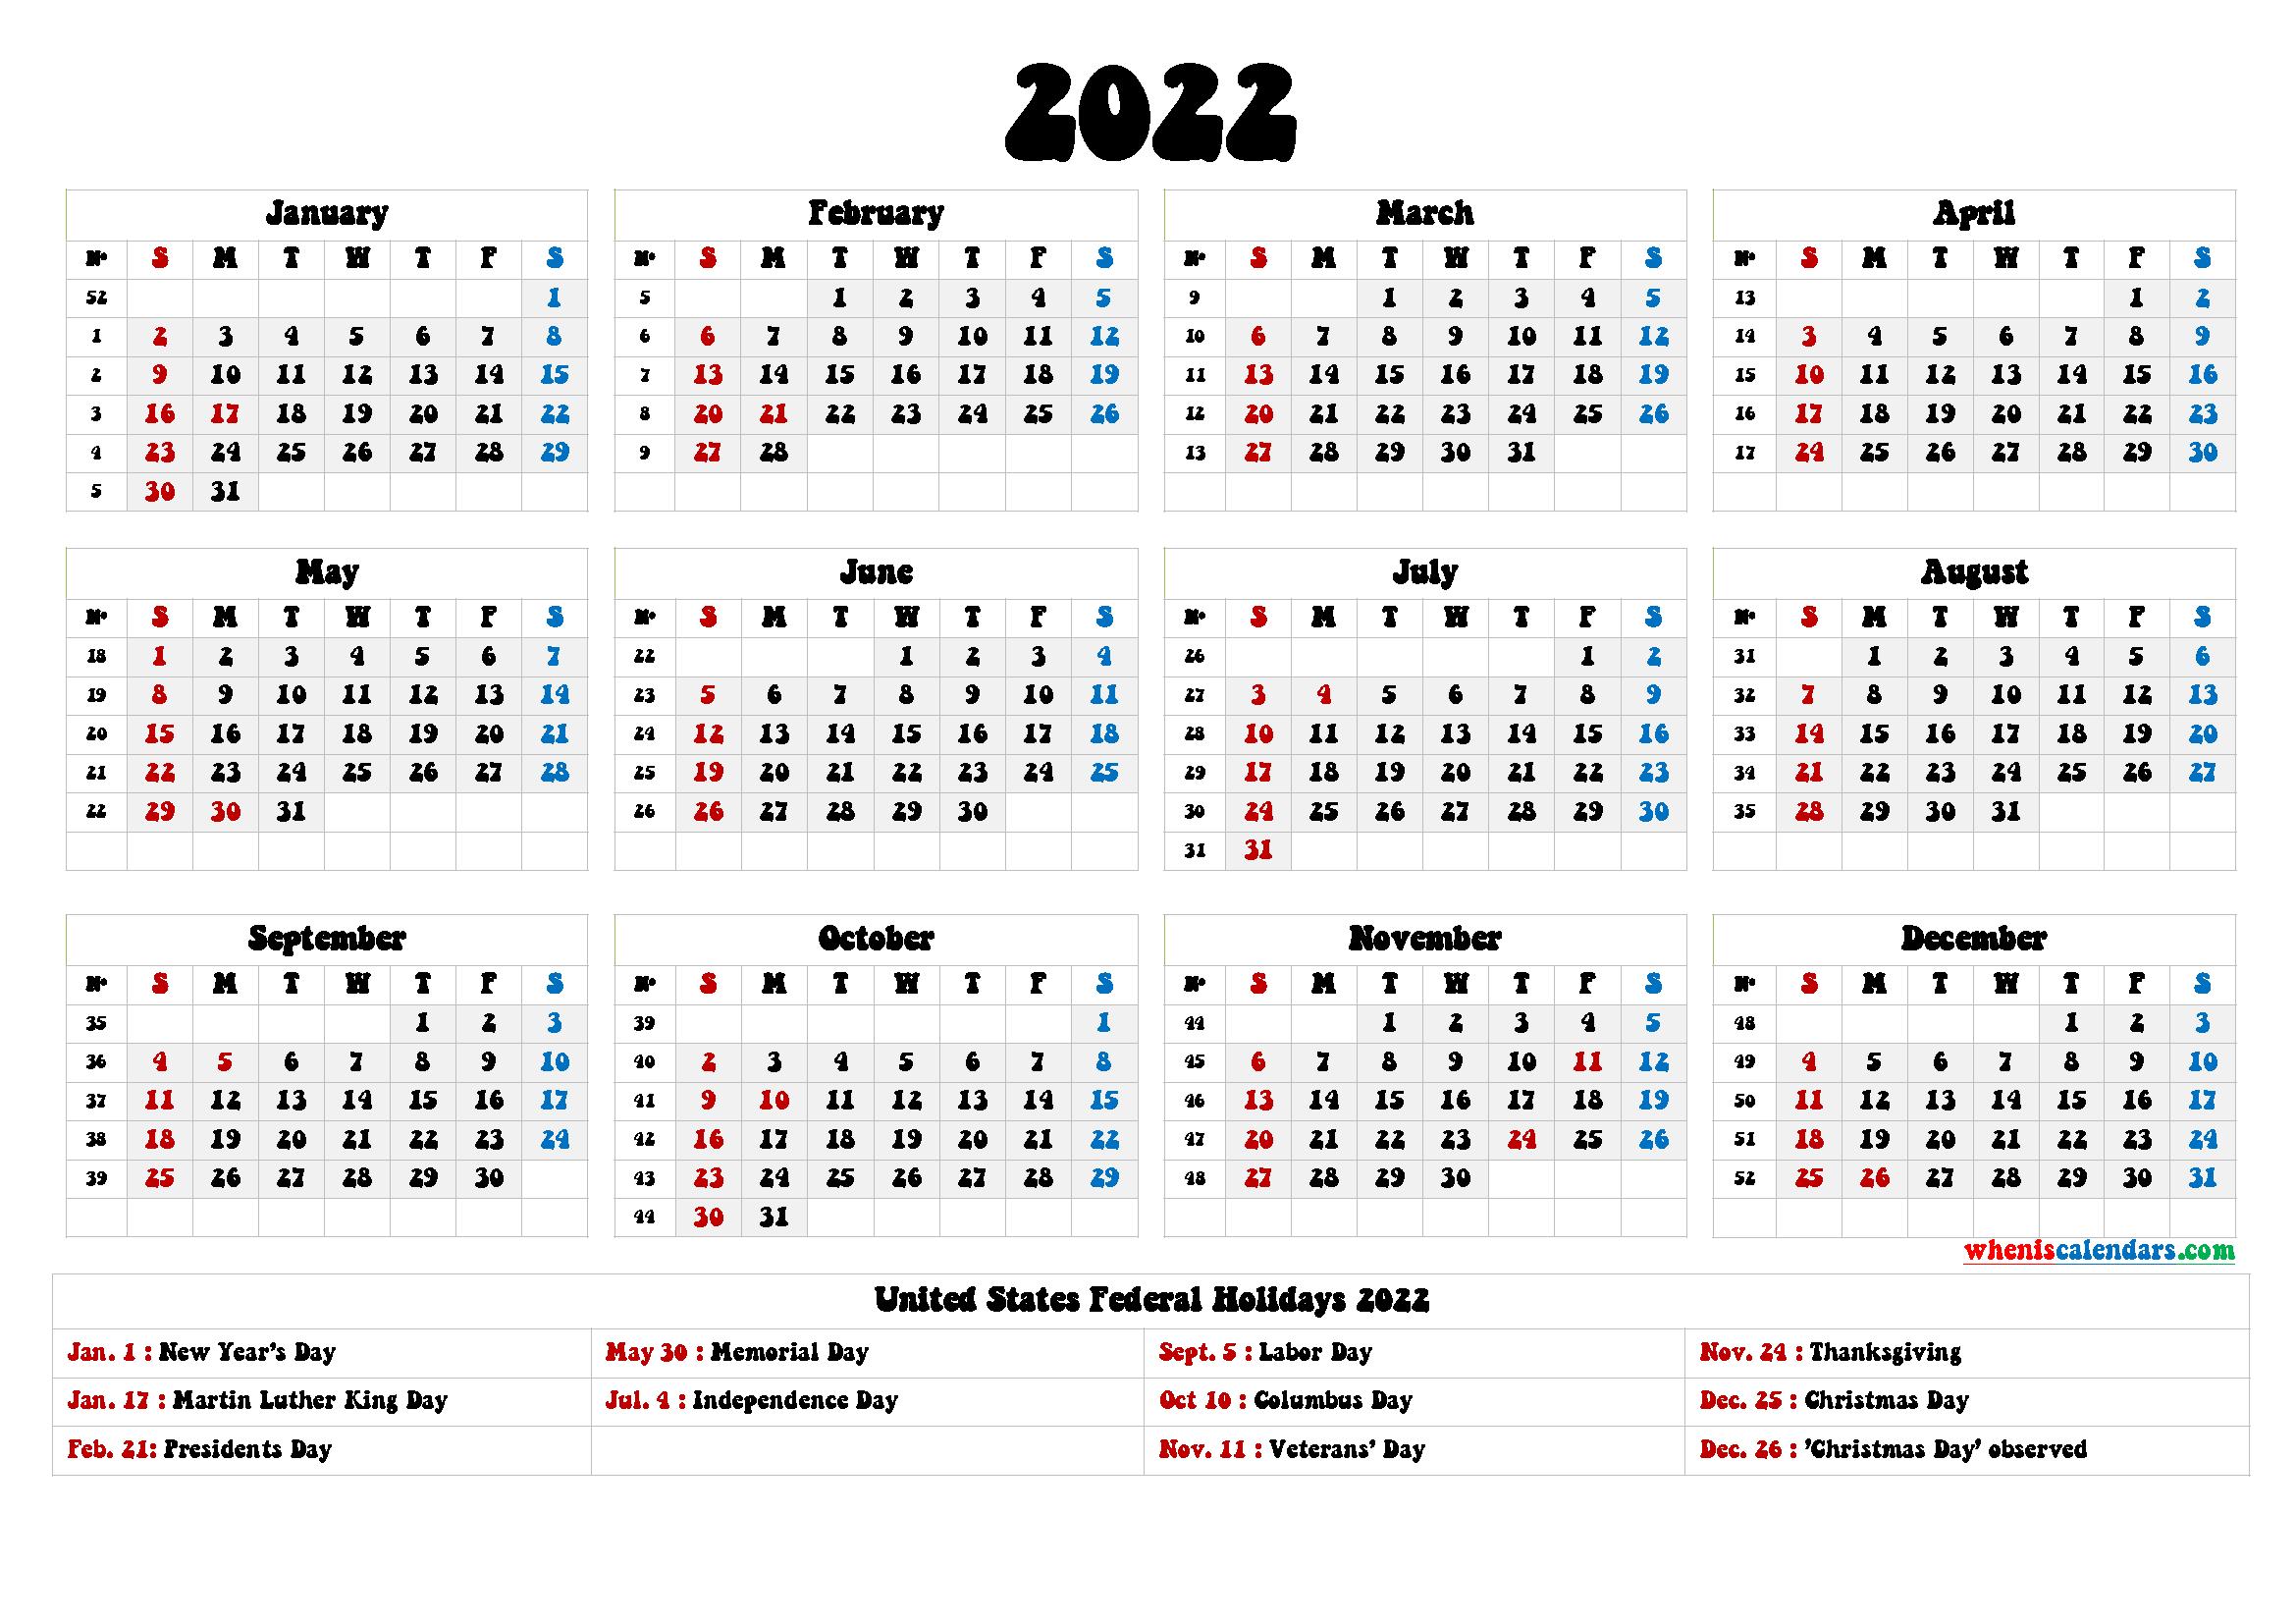 2022 Calendar Wallpapers Wallpaper Cave